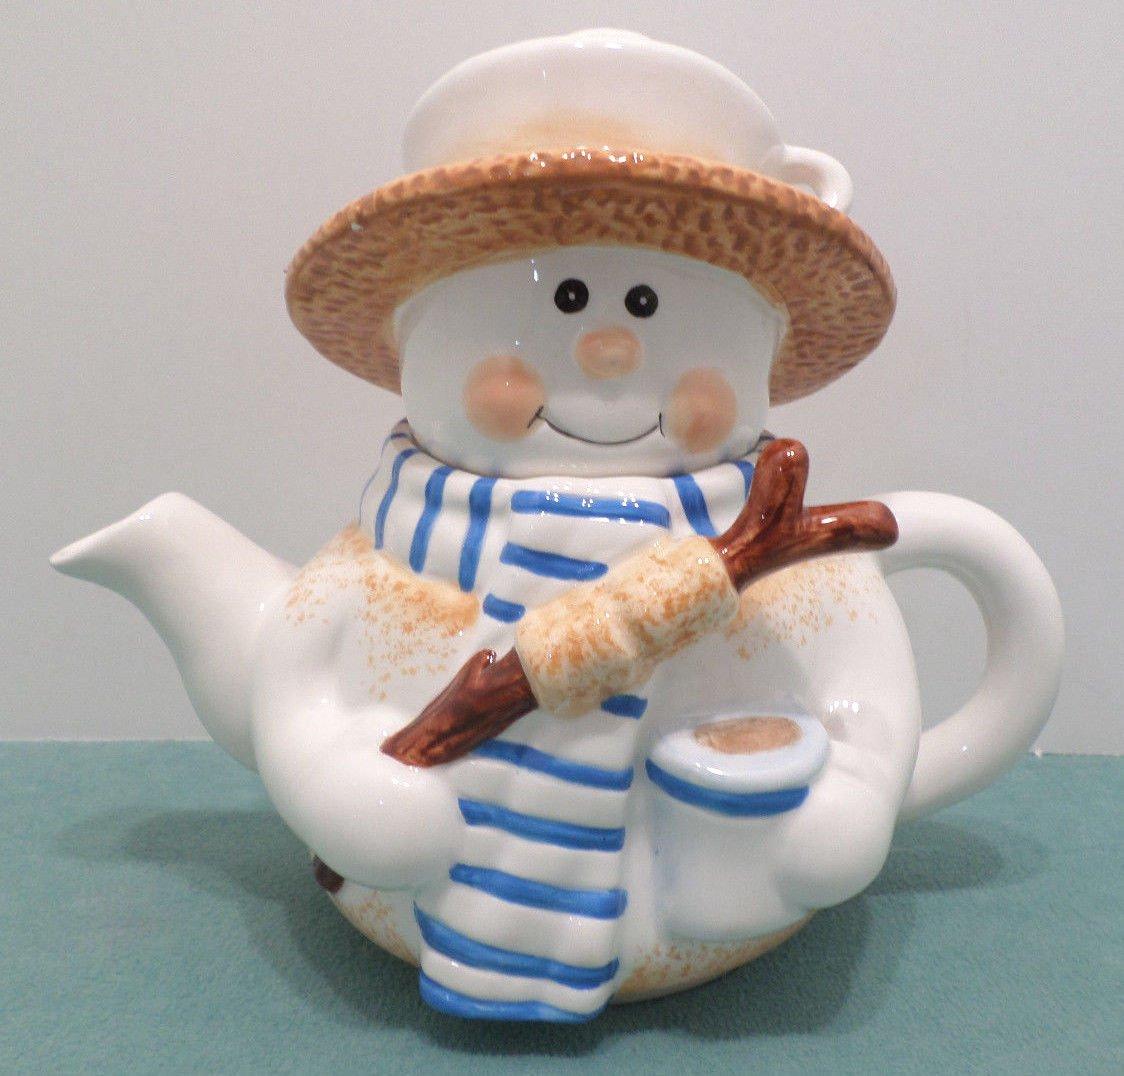 Porcelain Tea Pot Christmas Snowman Hot Chocolate with Marshmallows Ceramic